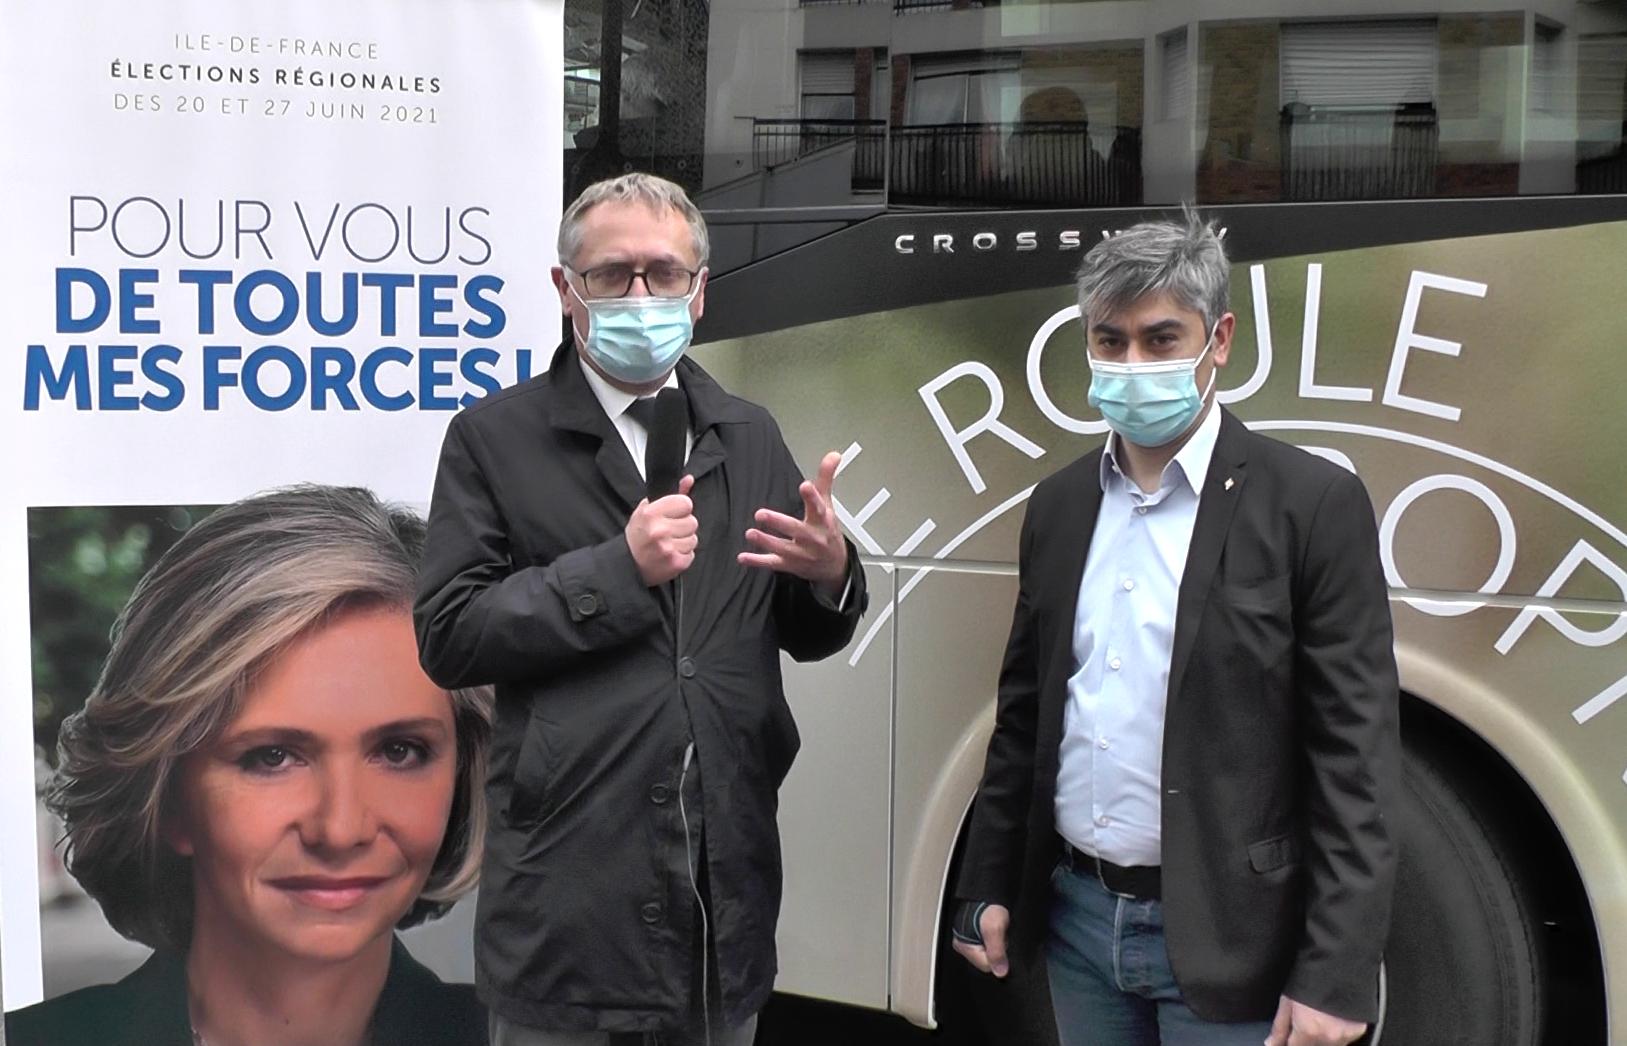 Entretien avec Philippe Juvin à Courbevoie ce mercredi 26 mai 2021